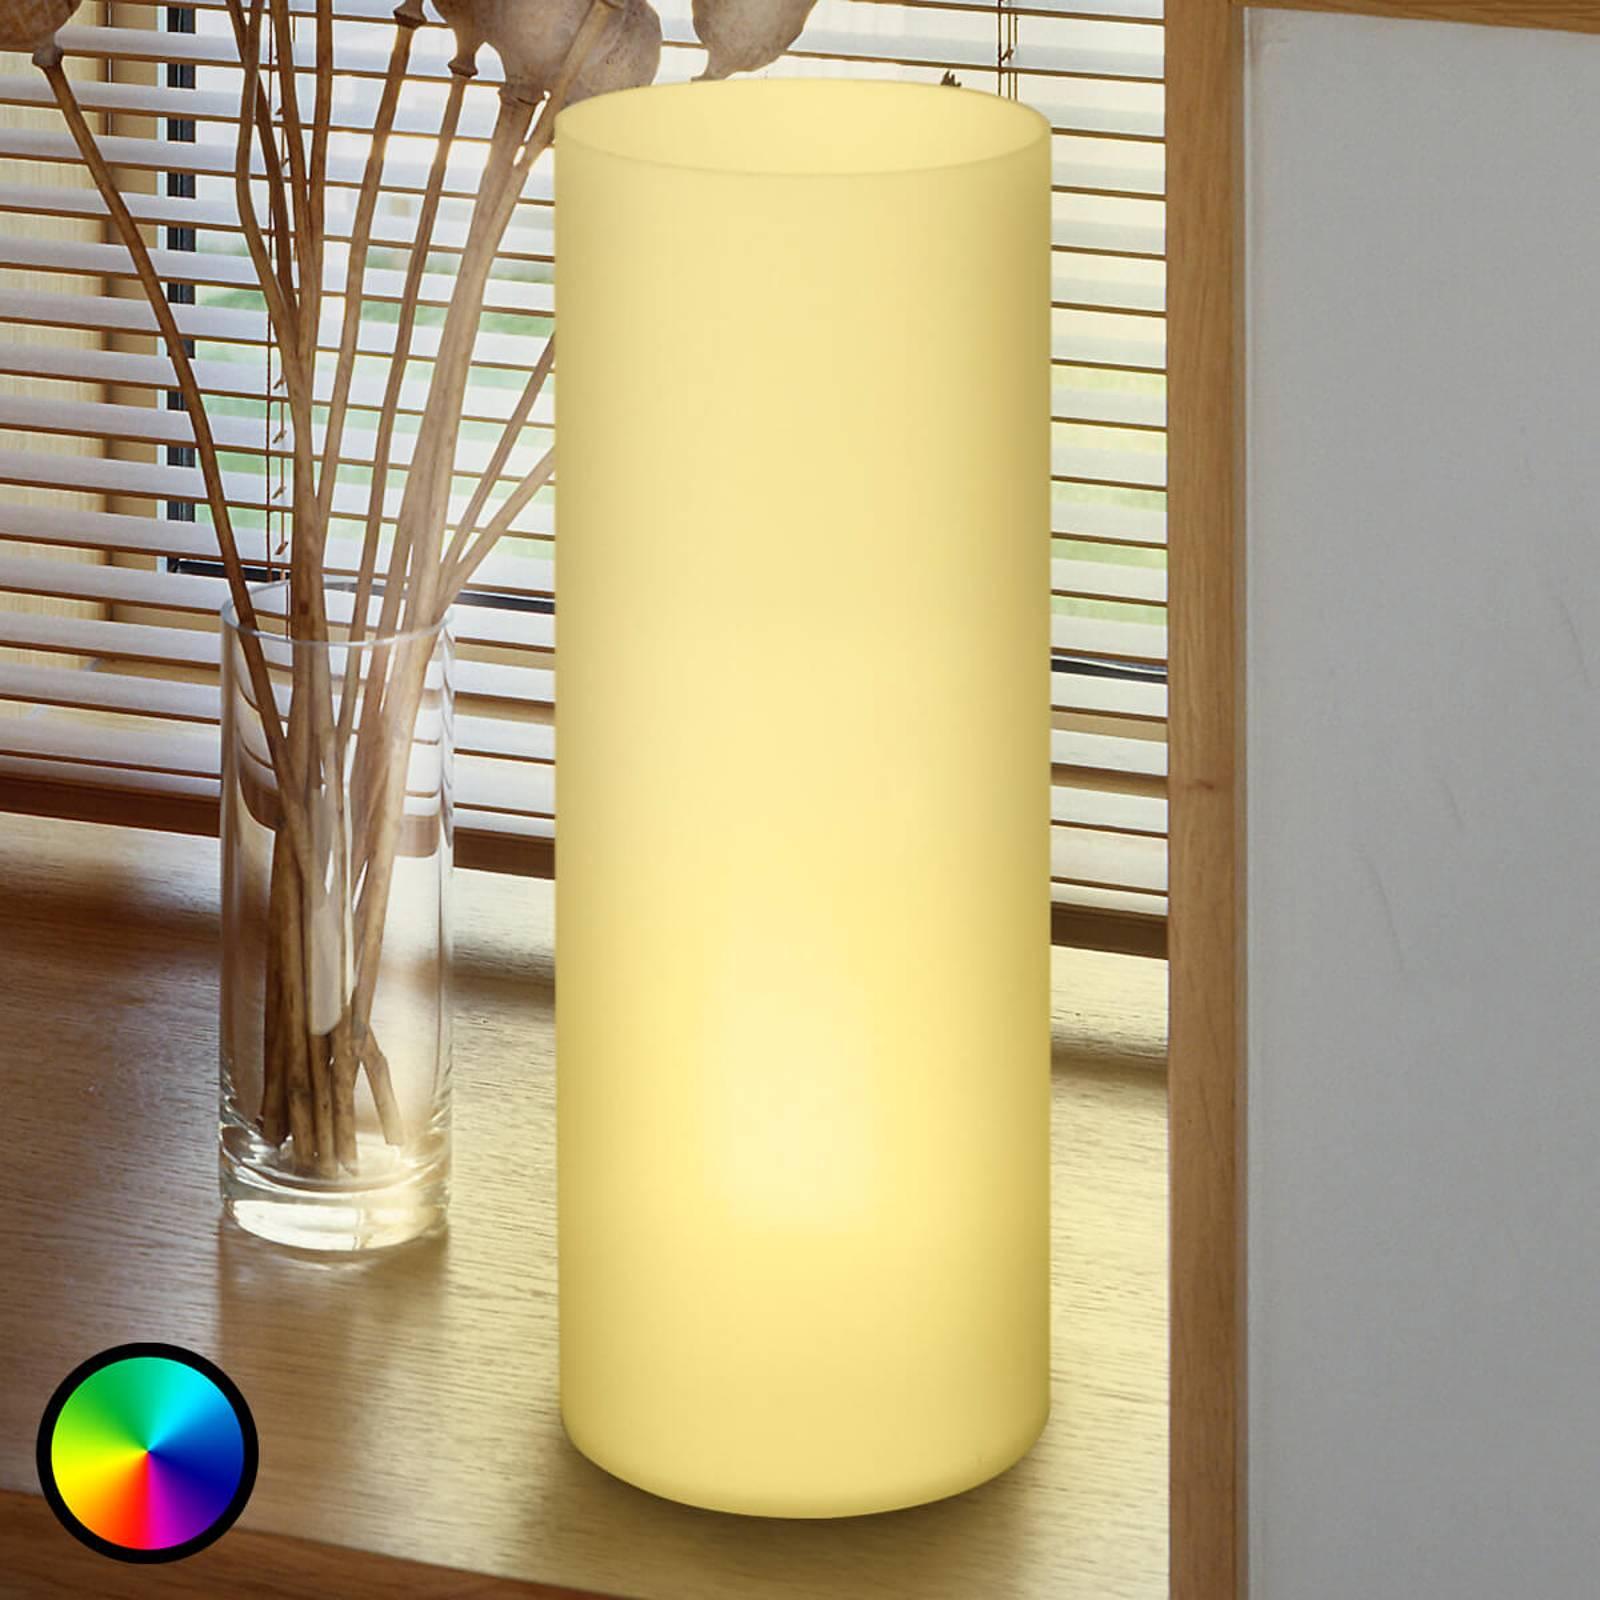 Buisvormige tafellamp Elluno-C LED RGBW